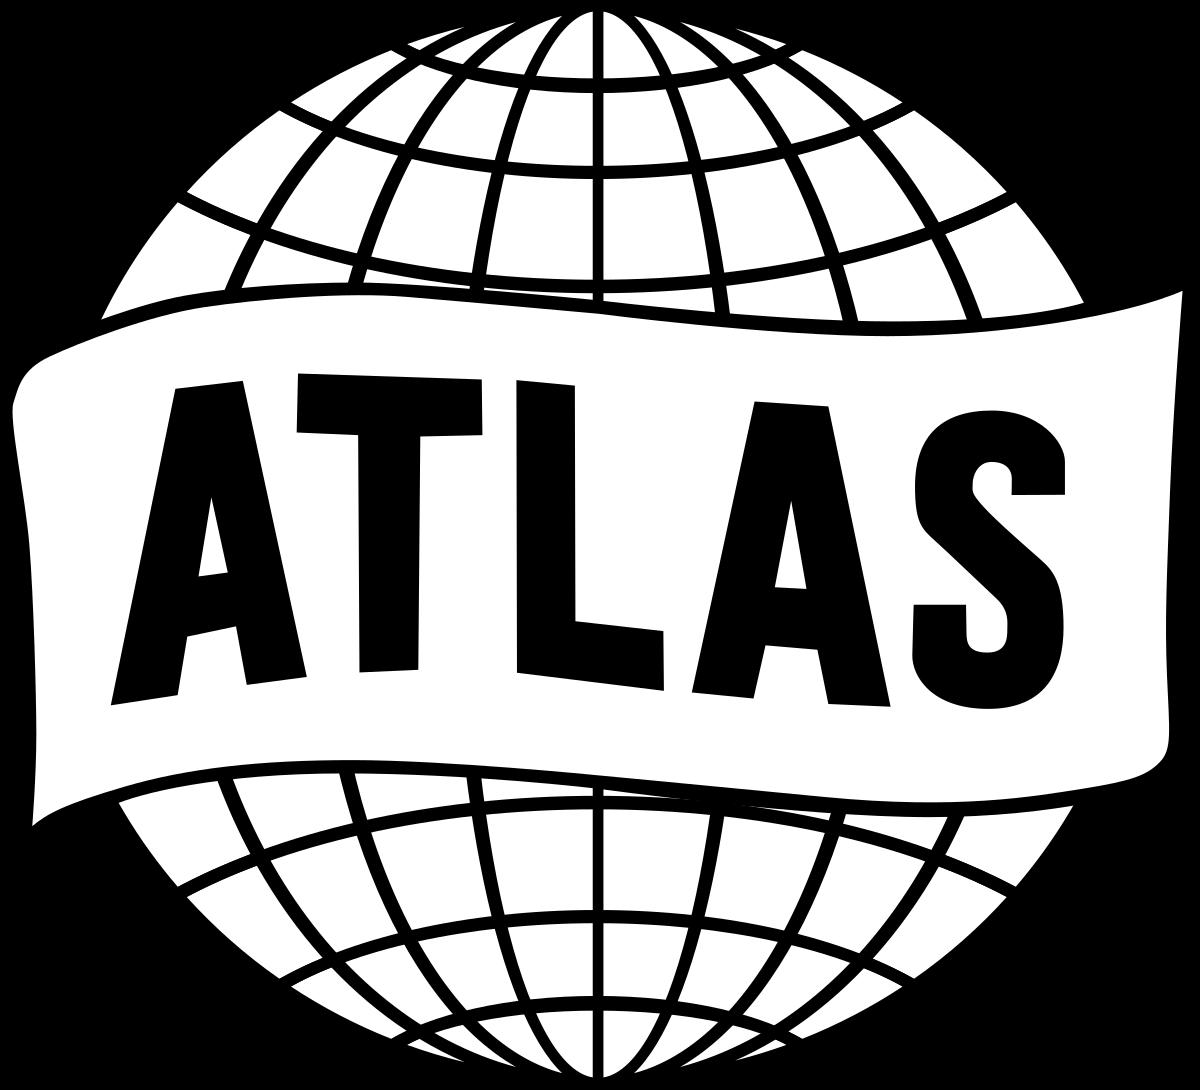 Comic book font clipart image stock Atlas Comics (1950s) - Wikipedia image stock